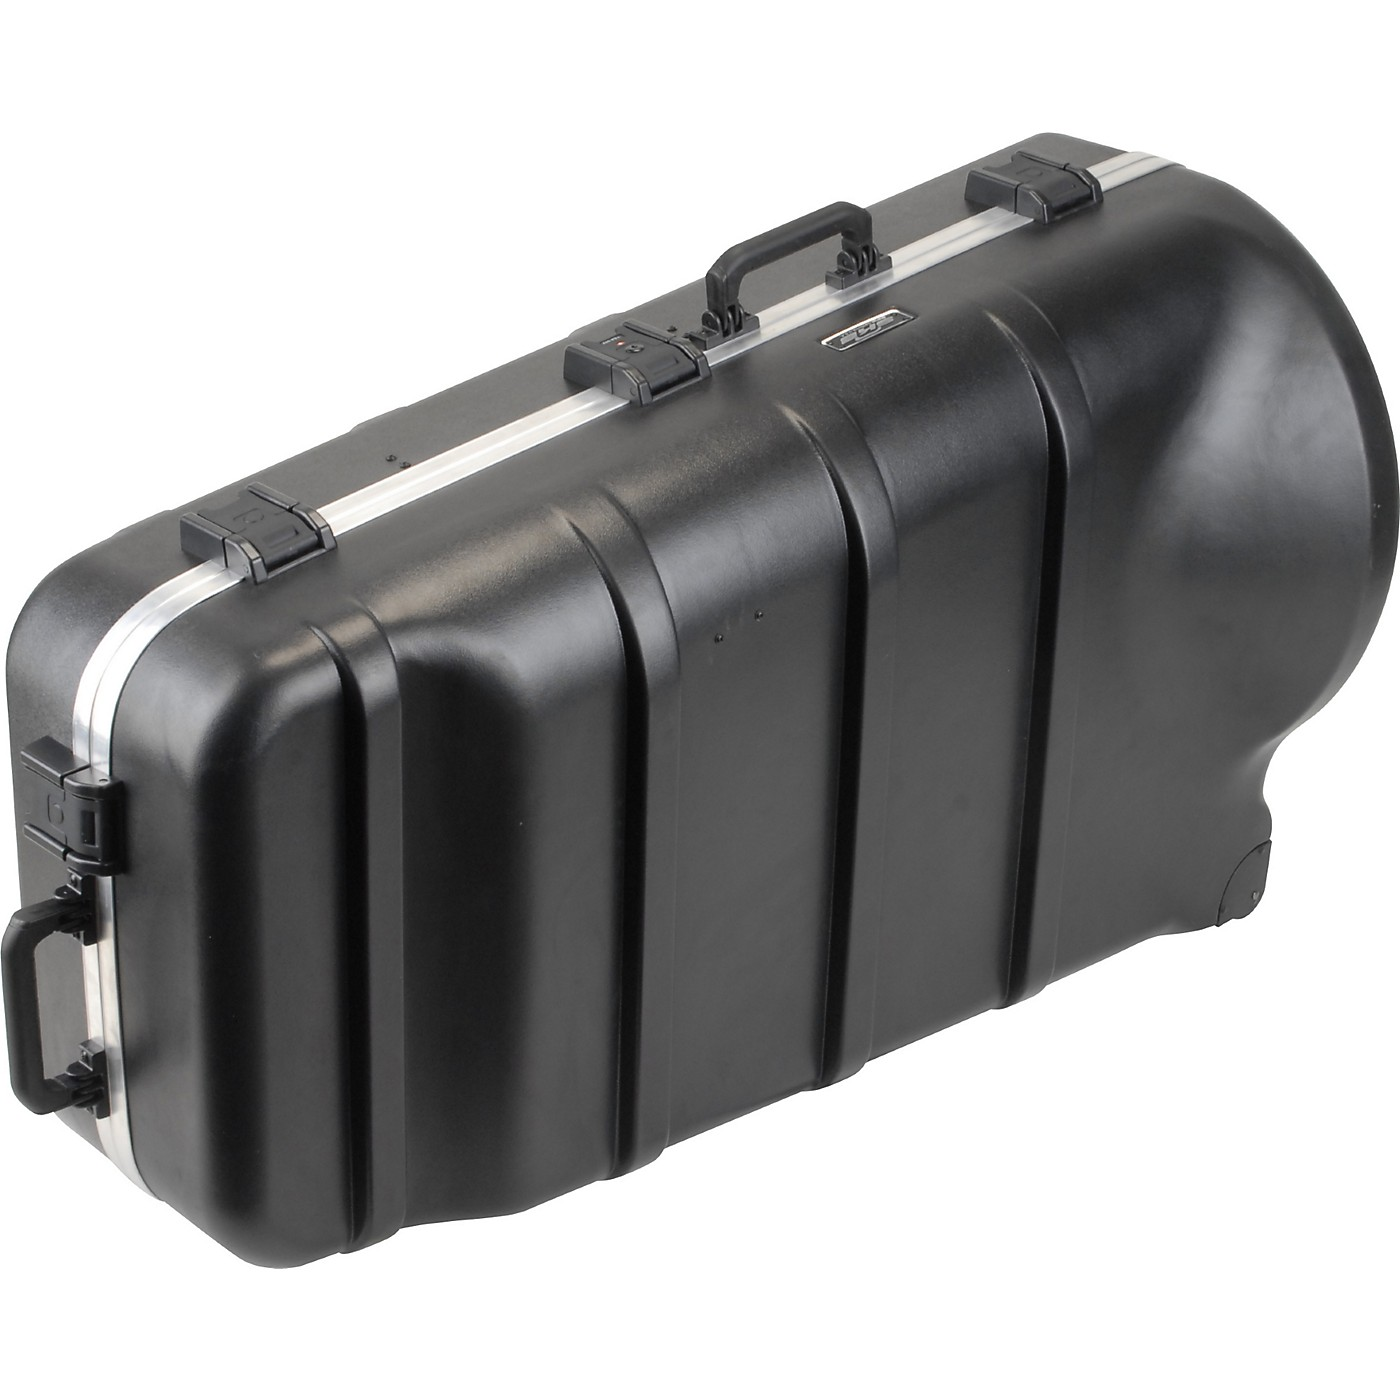 SKB 390W Large Universal Tuba Case with Wheels thumbnail